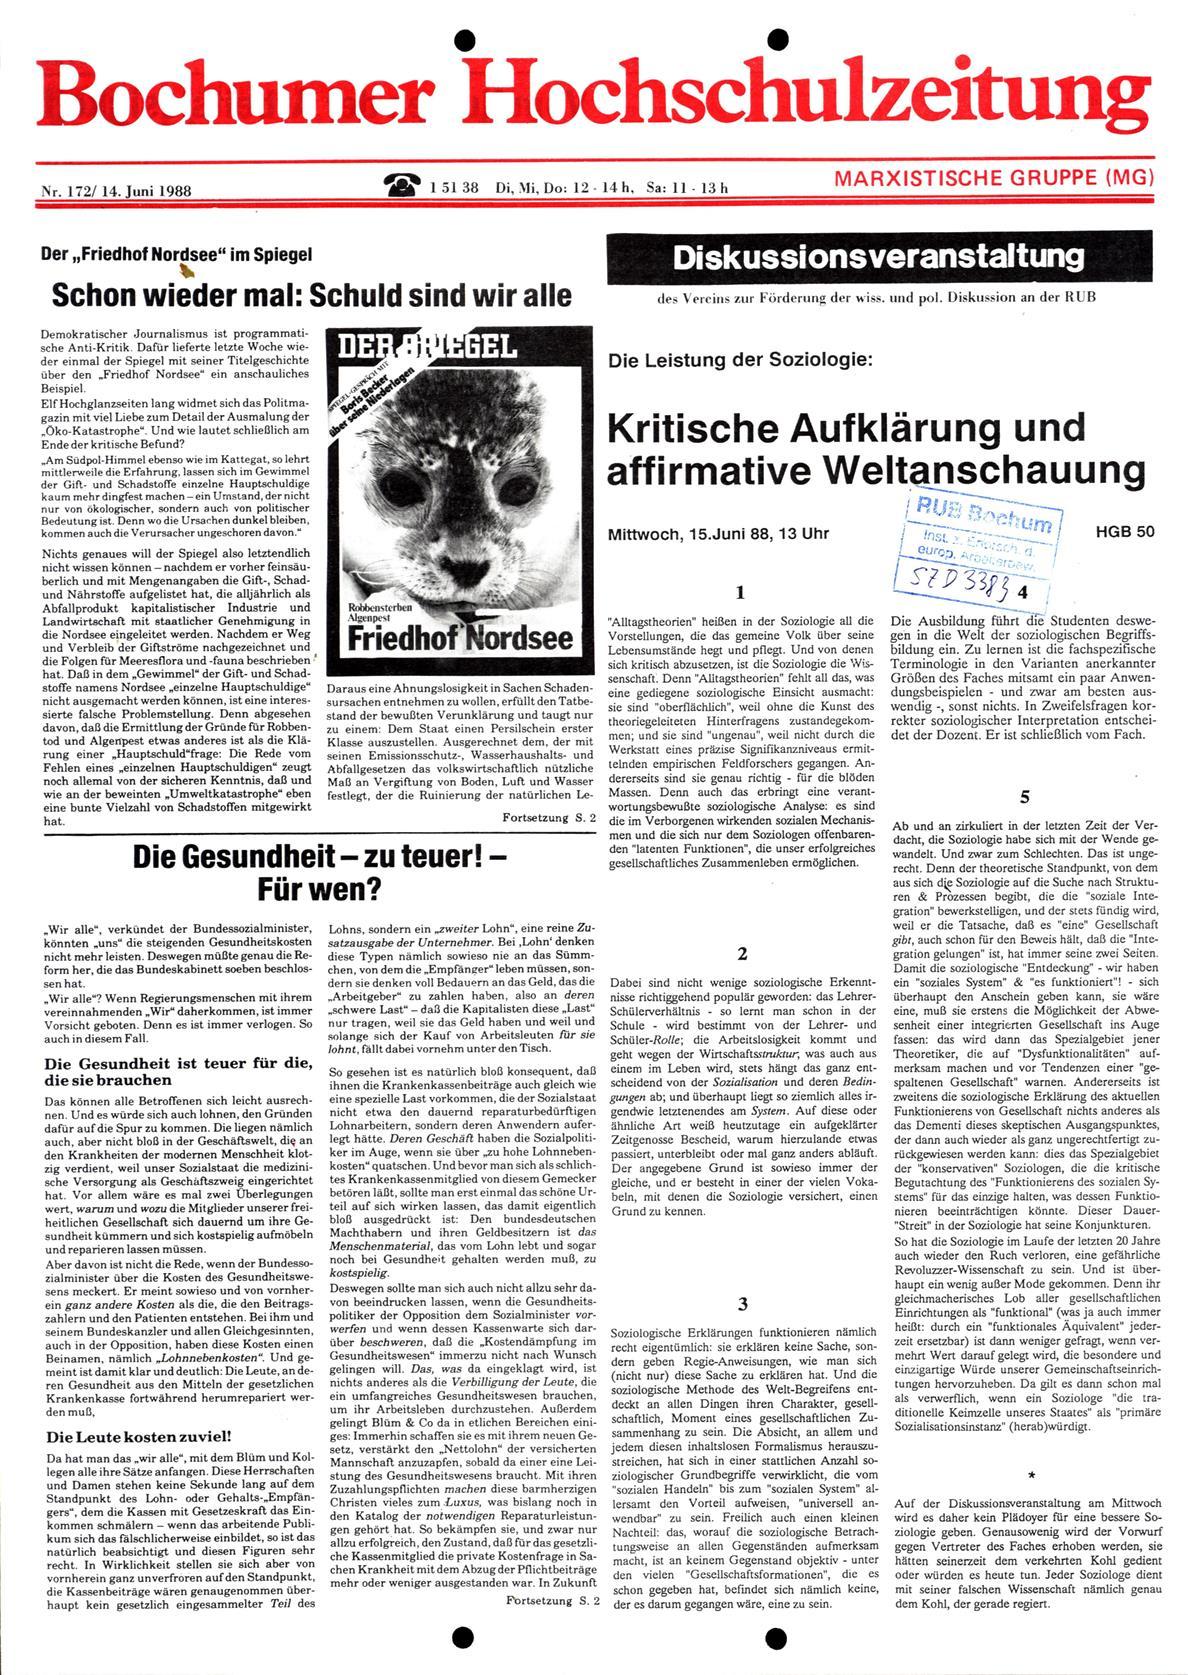 Bochum_BHZ_19880614_172_001